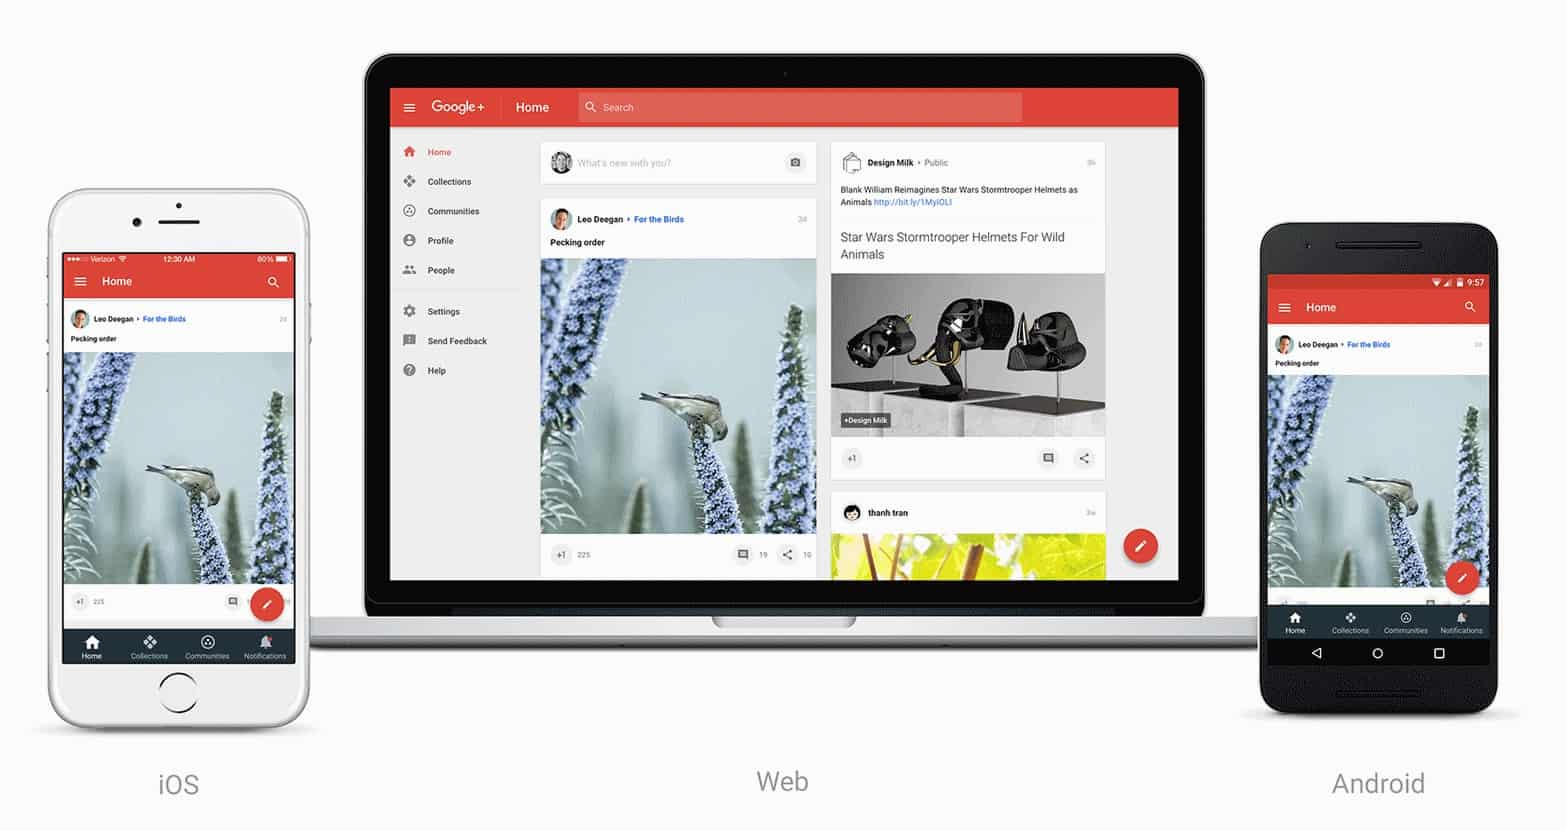 new Google +